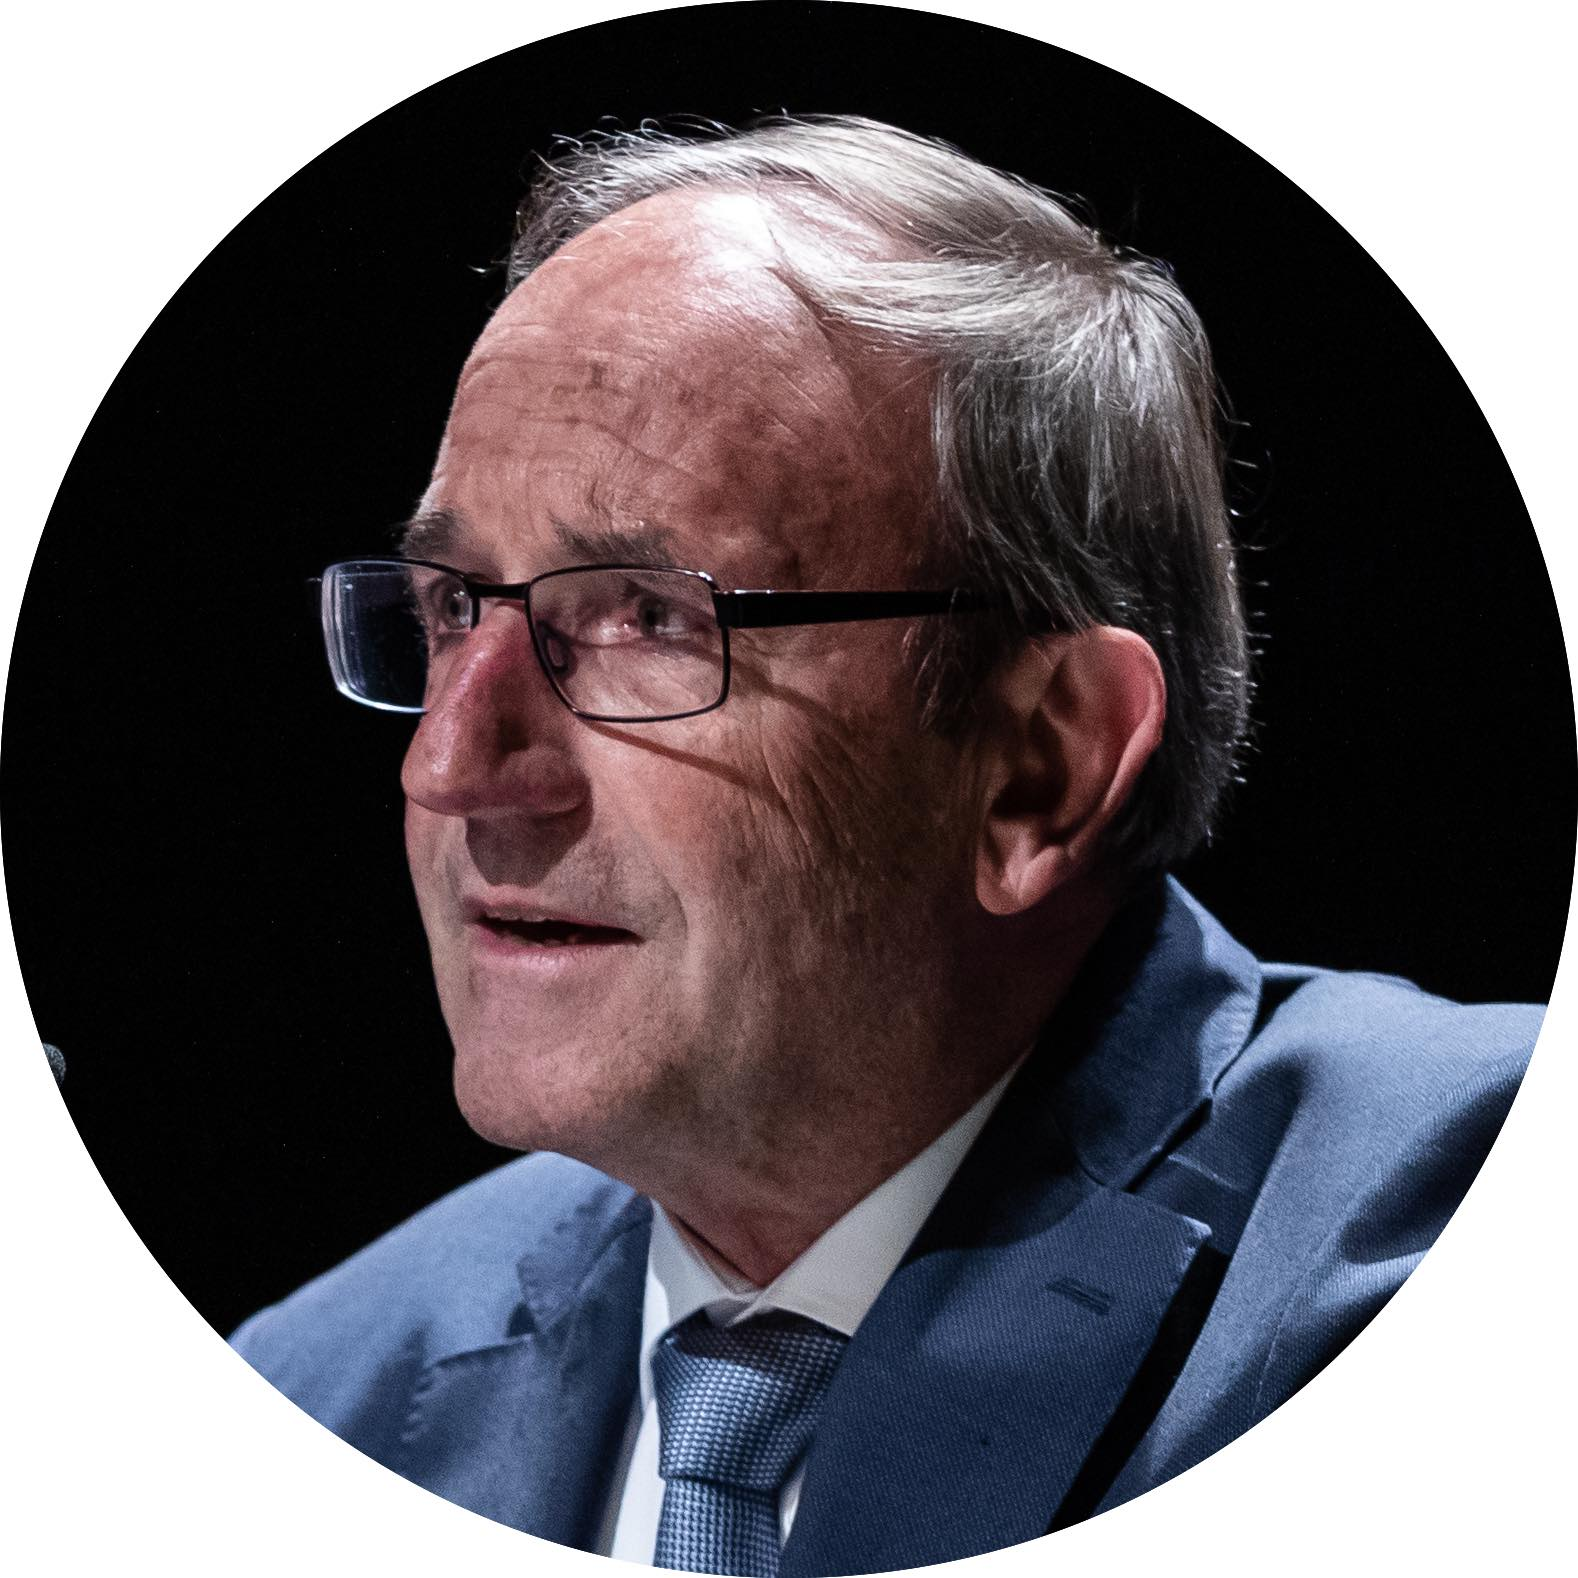 2007 - Jürg Schärer wird Präsident